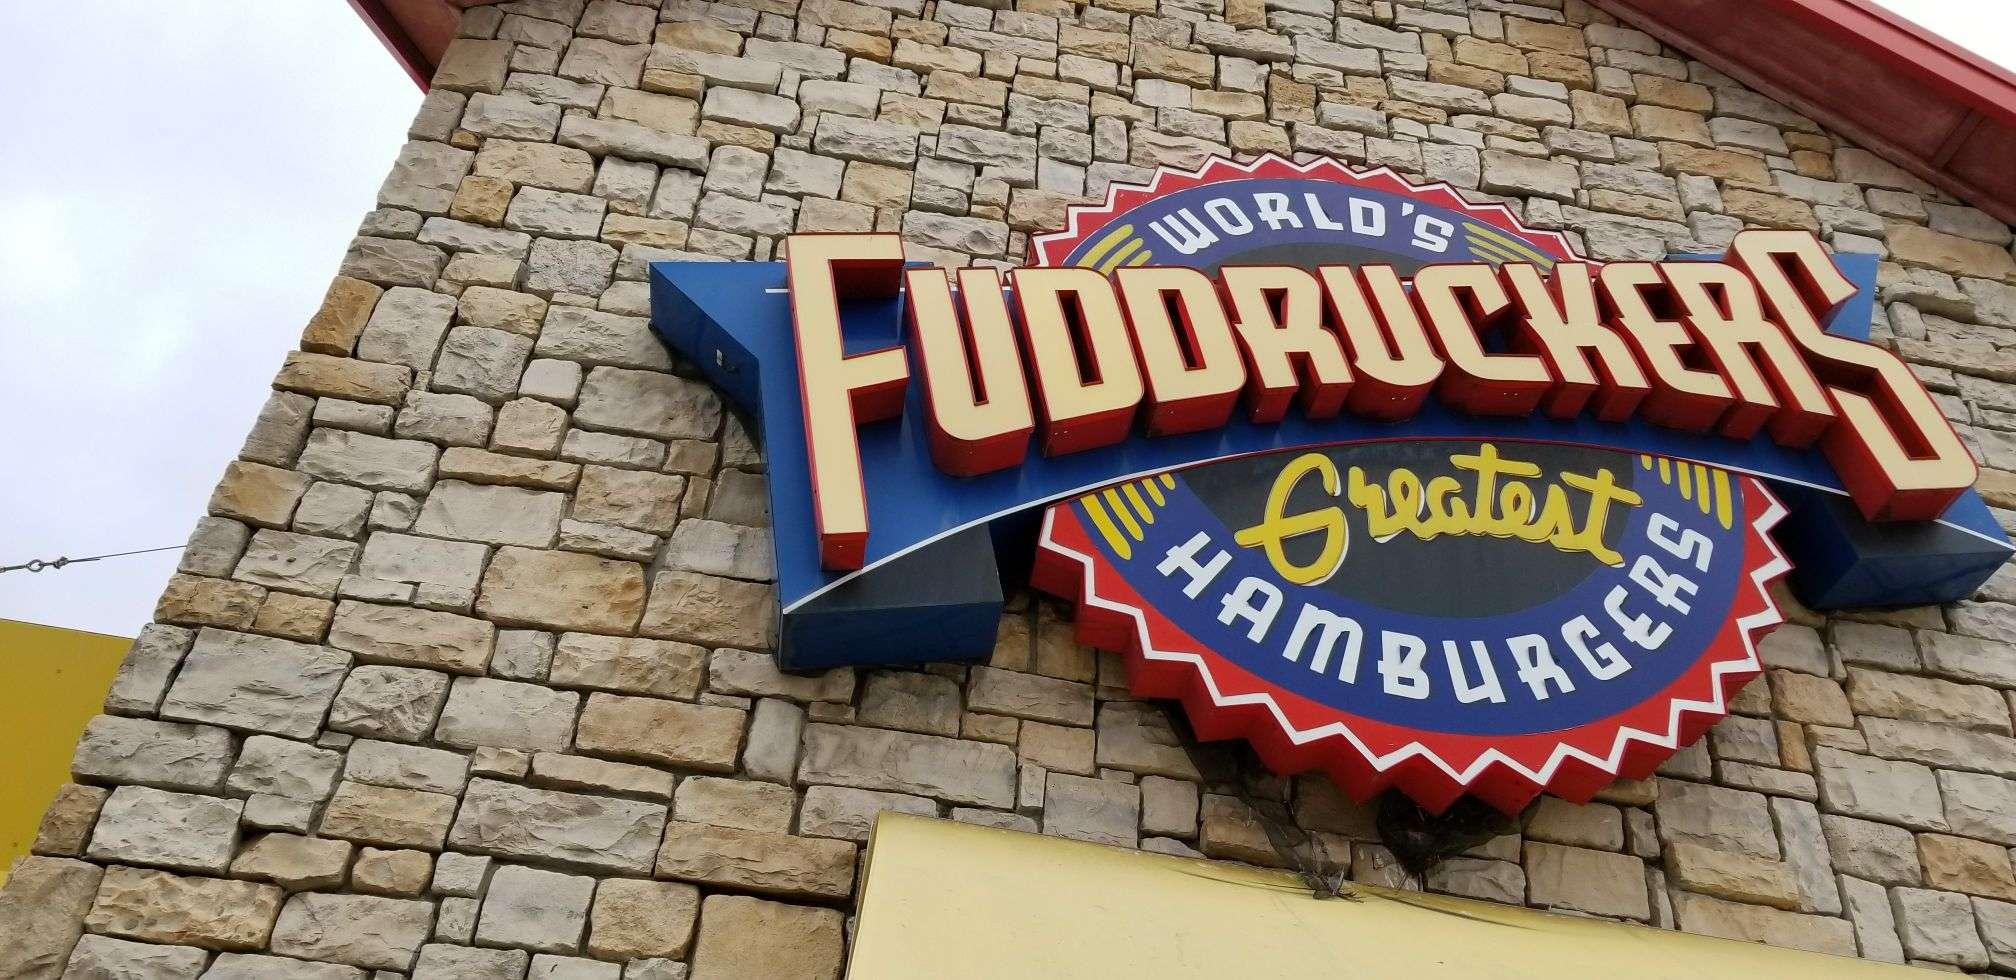 Fuddruckers Sign